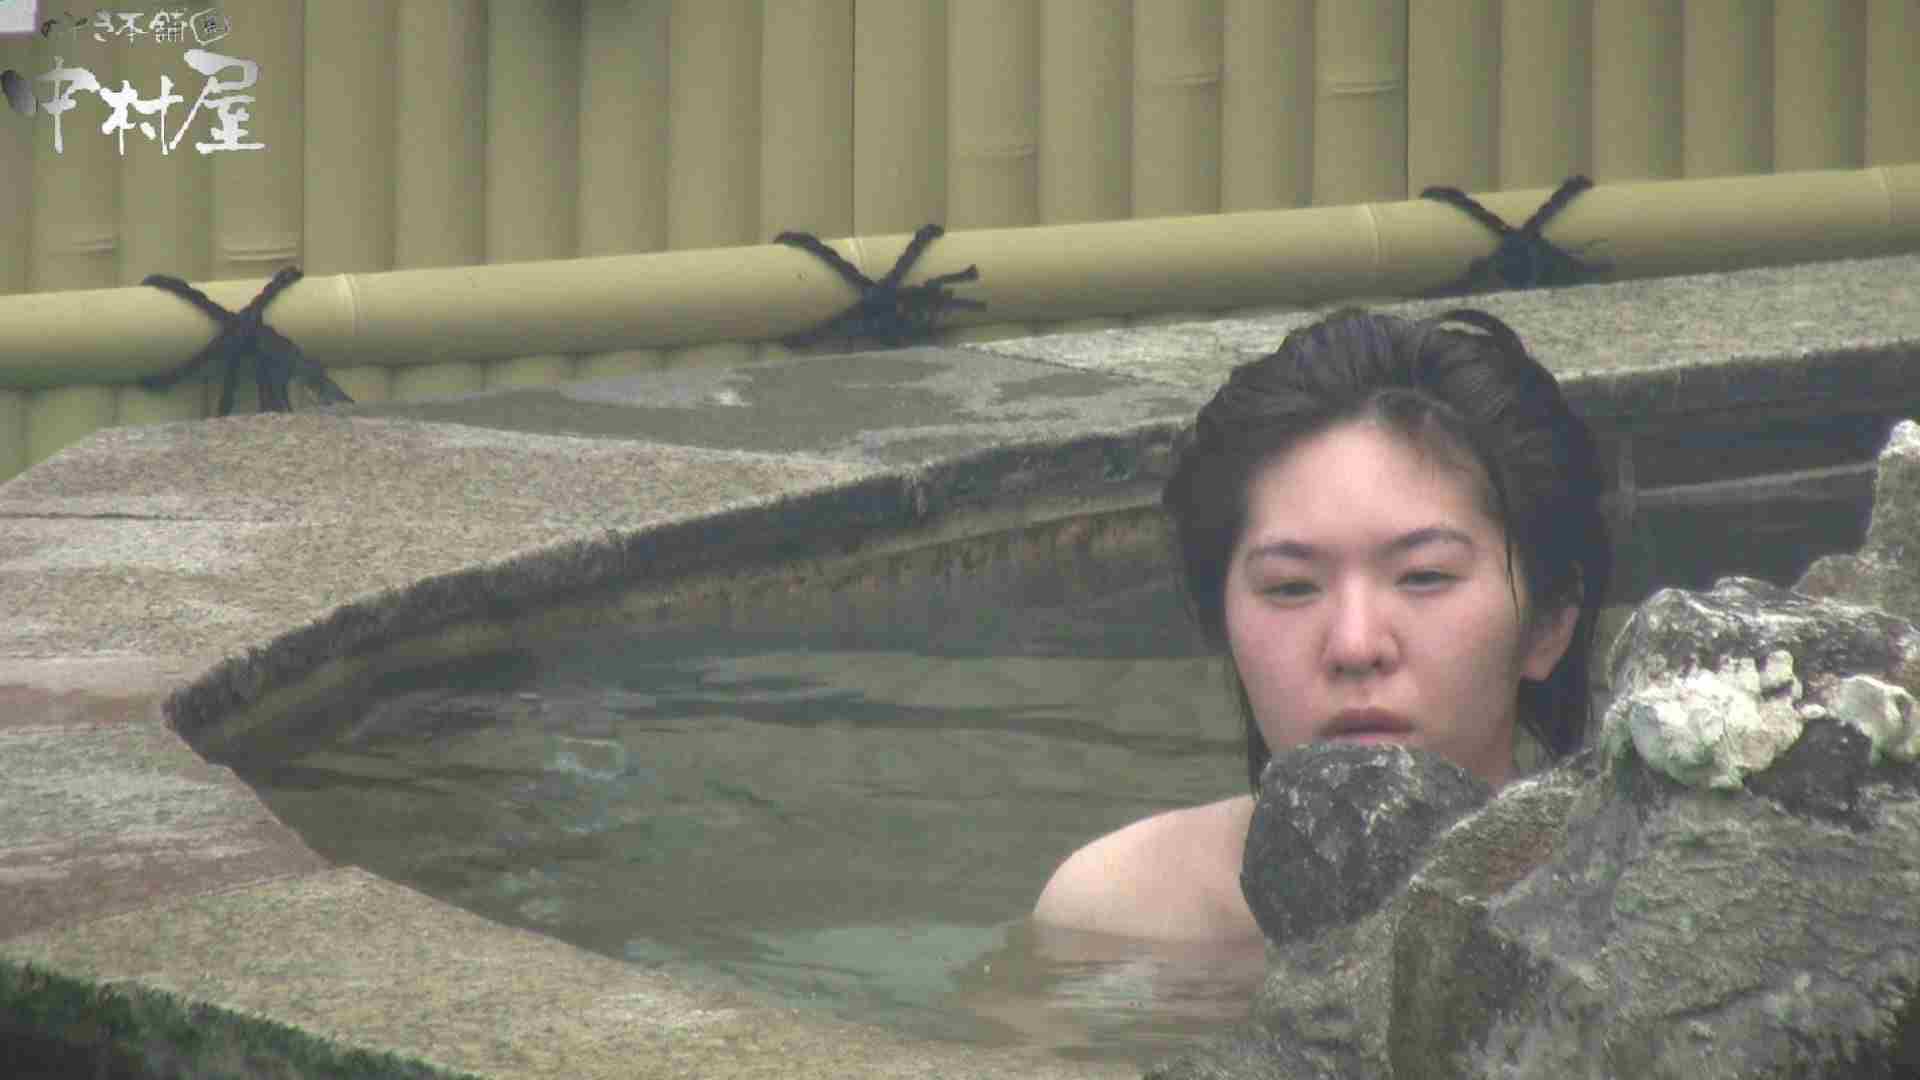 Aquaな露天風呂Vol.907 盗撮特撮 | OLのプライベート  12pic 4